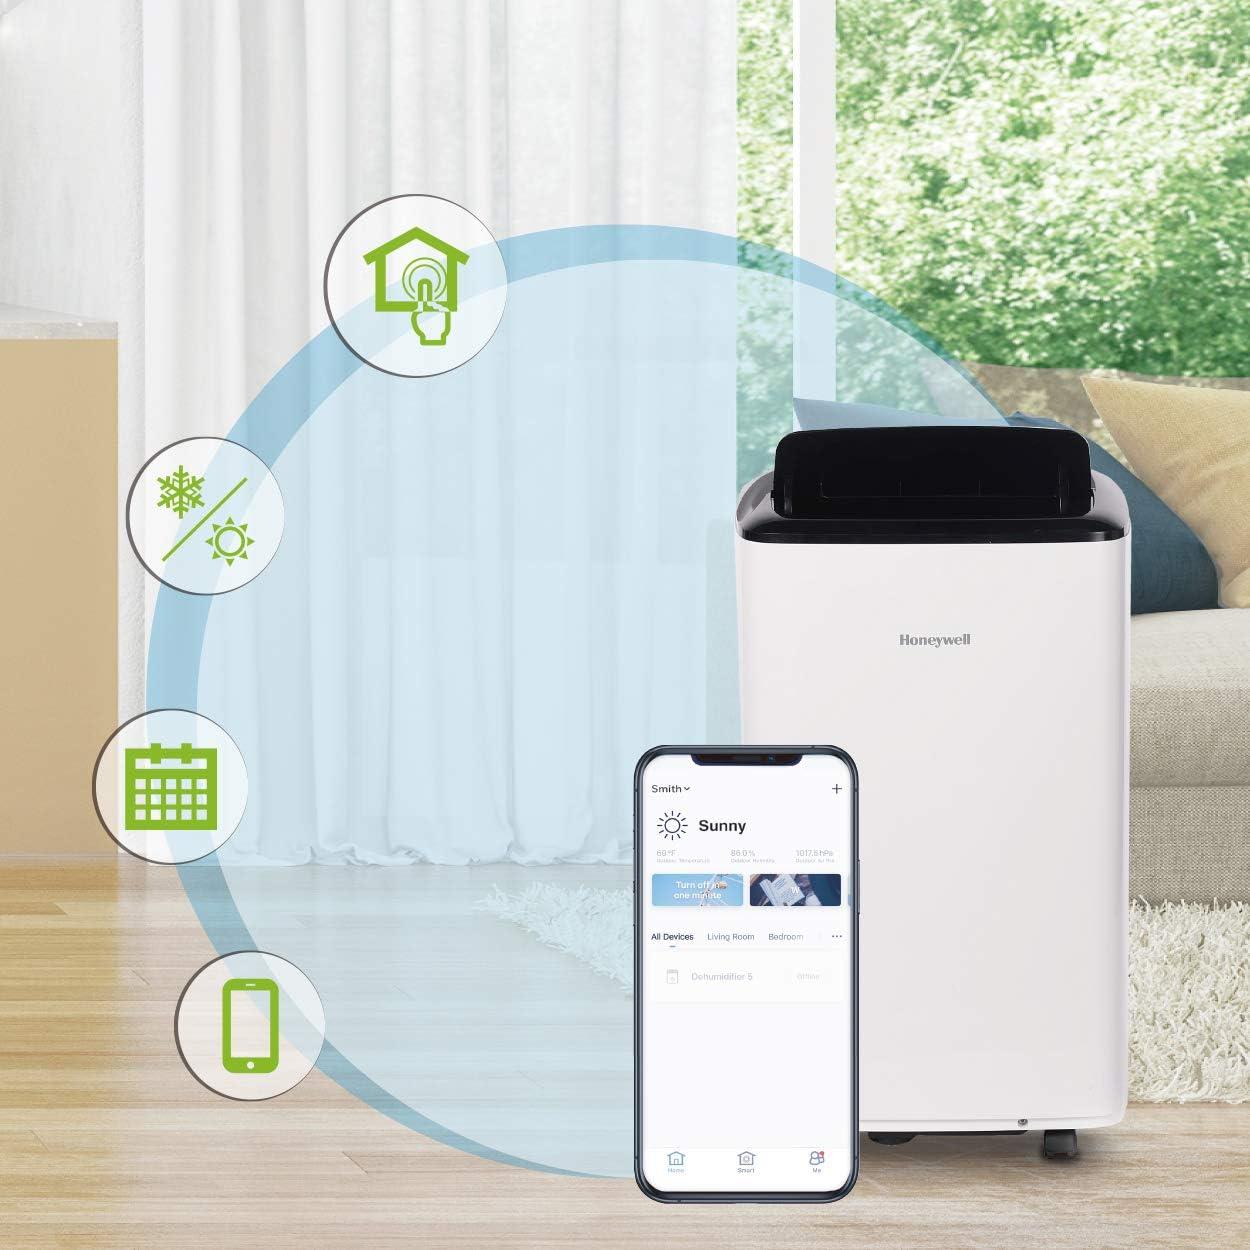 Honeywell, White 8,000 BTU Smart WiFi Portable Air Conditioner (350 sq.ft.) with Drain Pan & Window Insulation Tape, Black